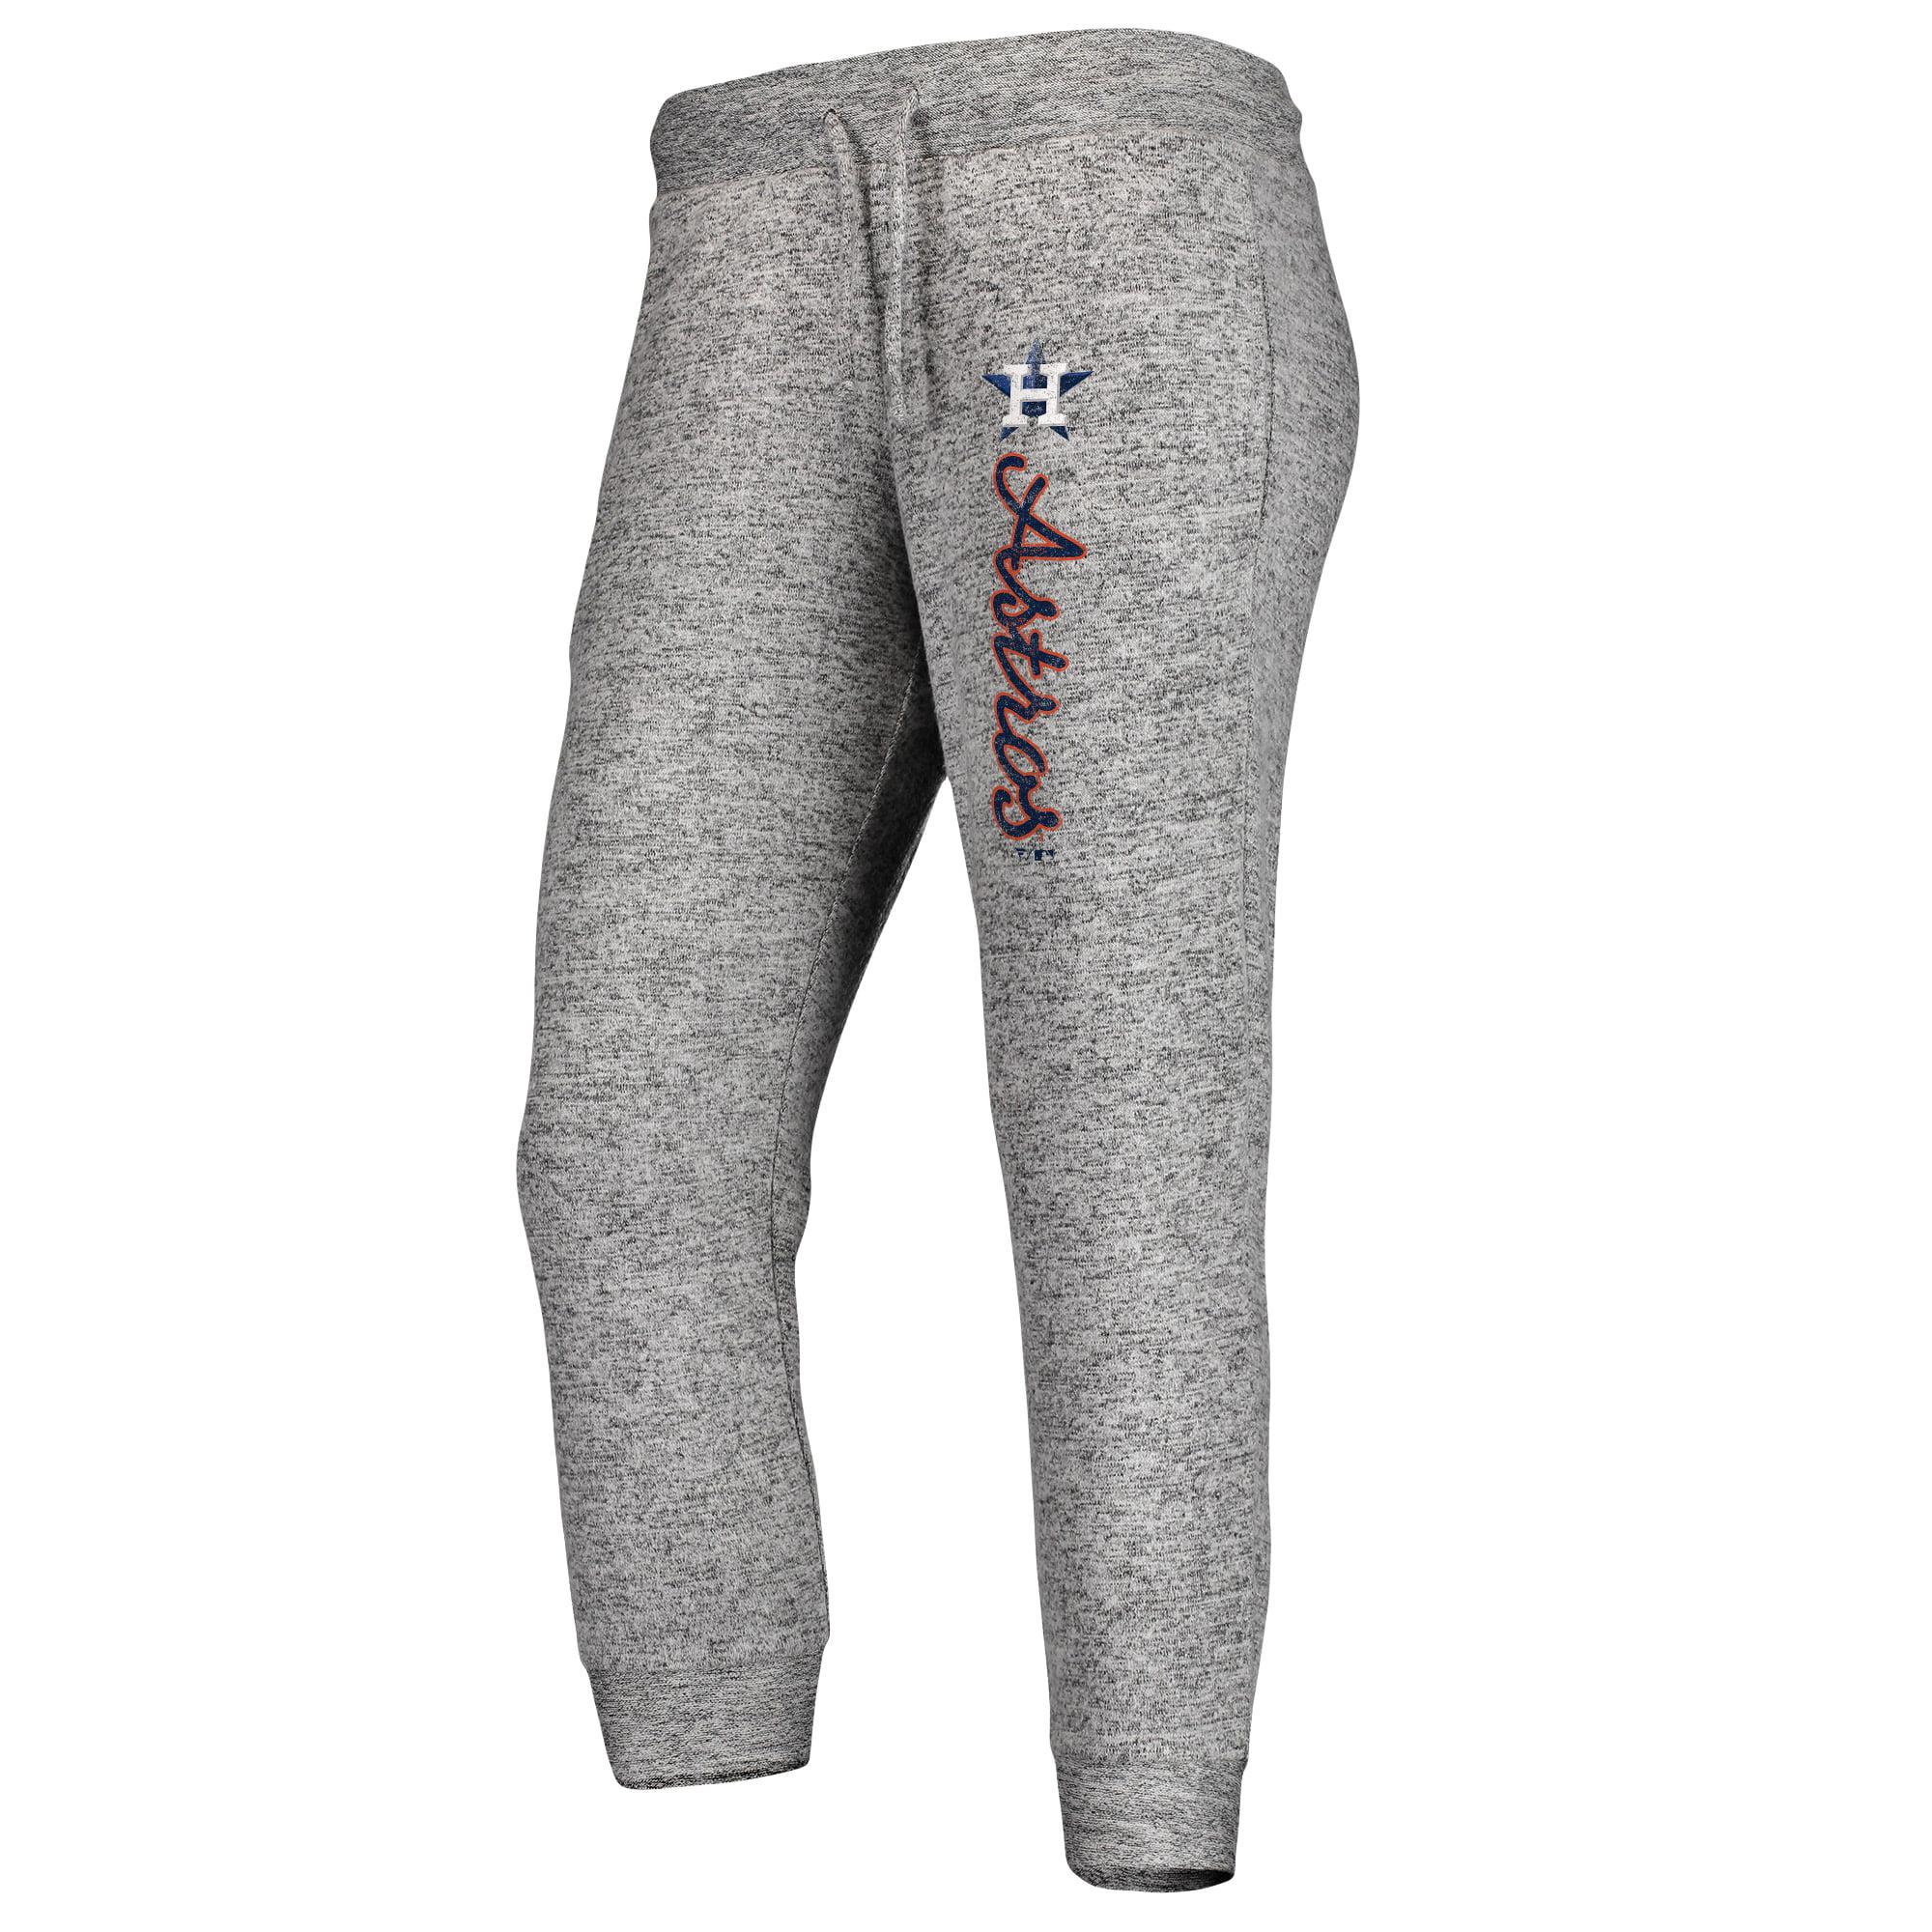 Houston Astros Fanatics Branded Women's Cozy Steadfast Jogger Pants - Heathered Gray